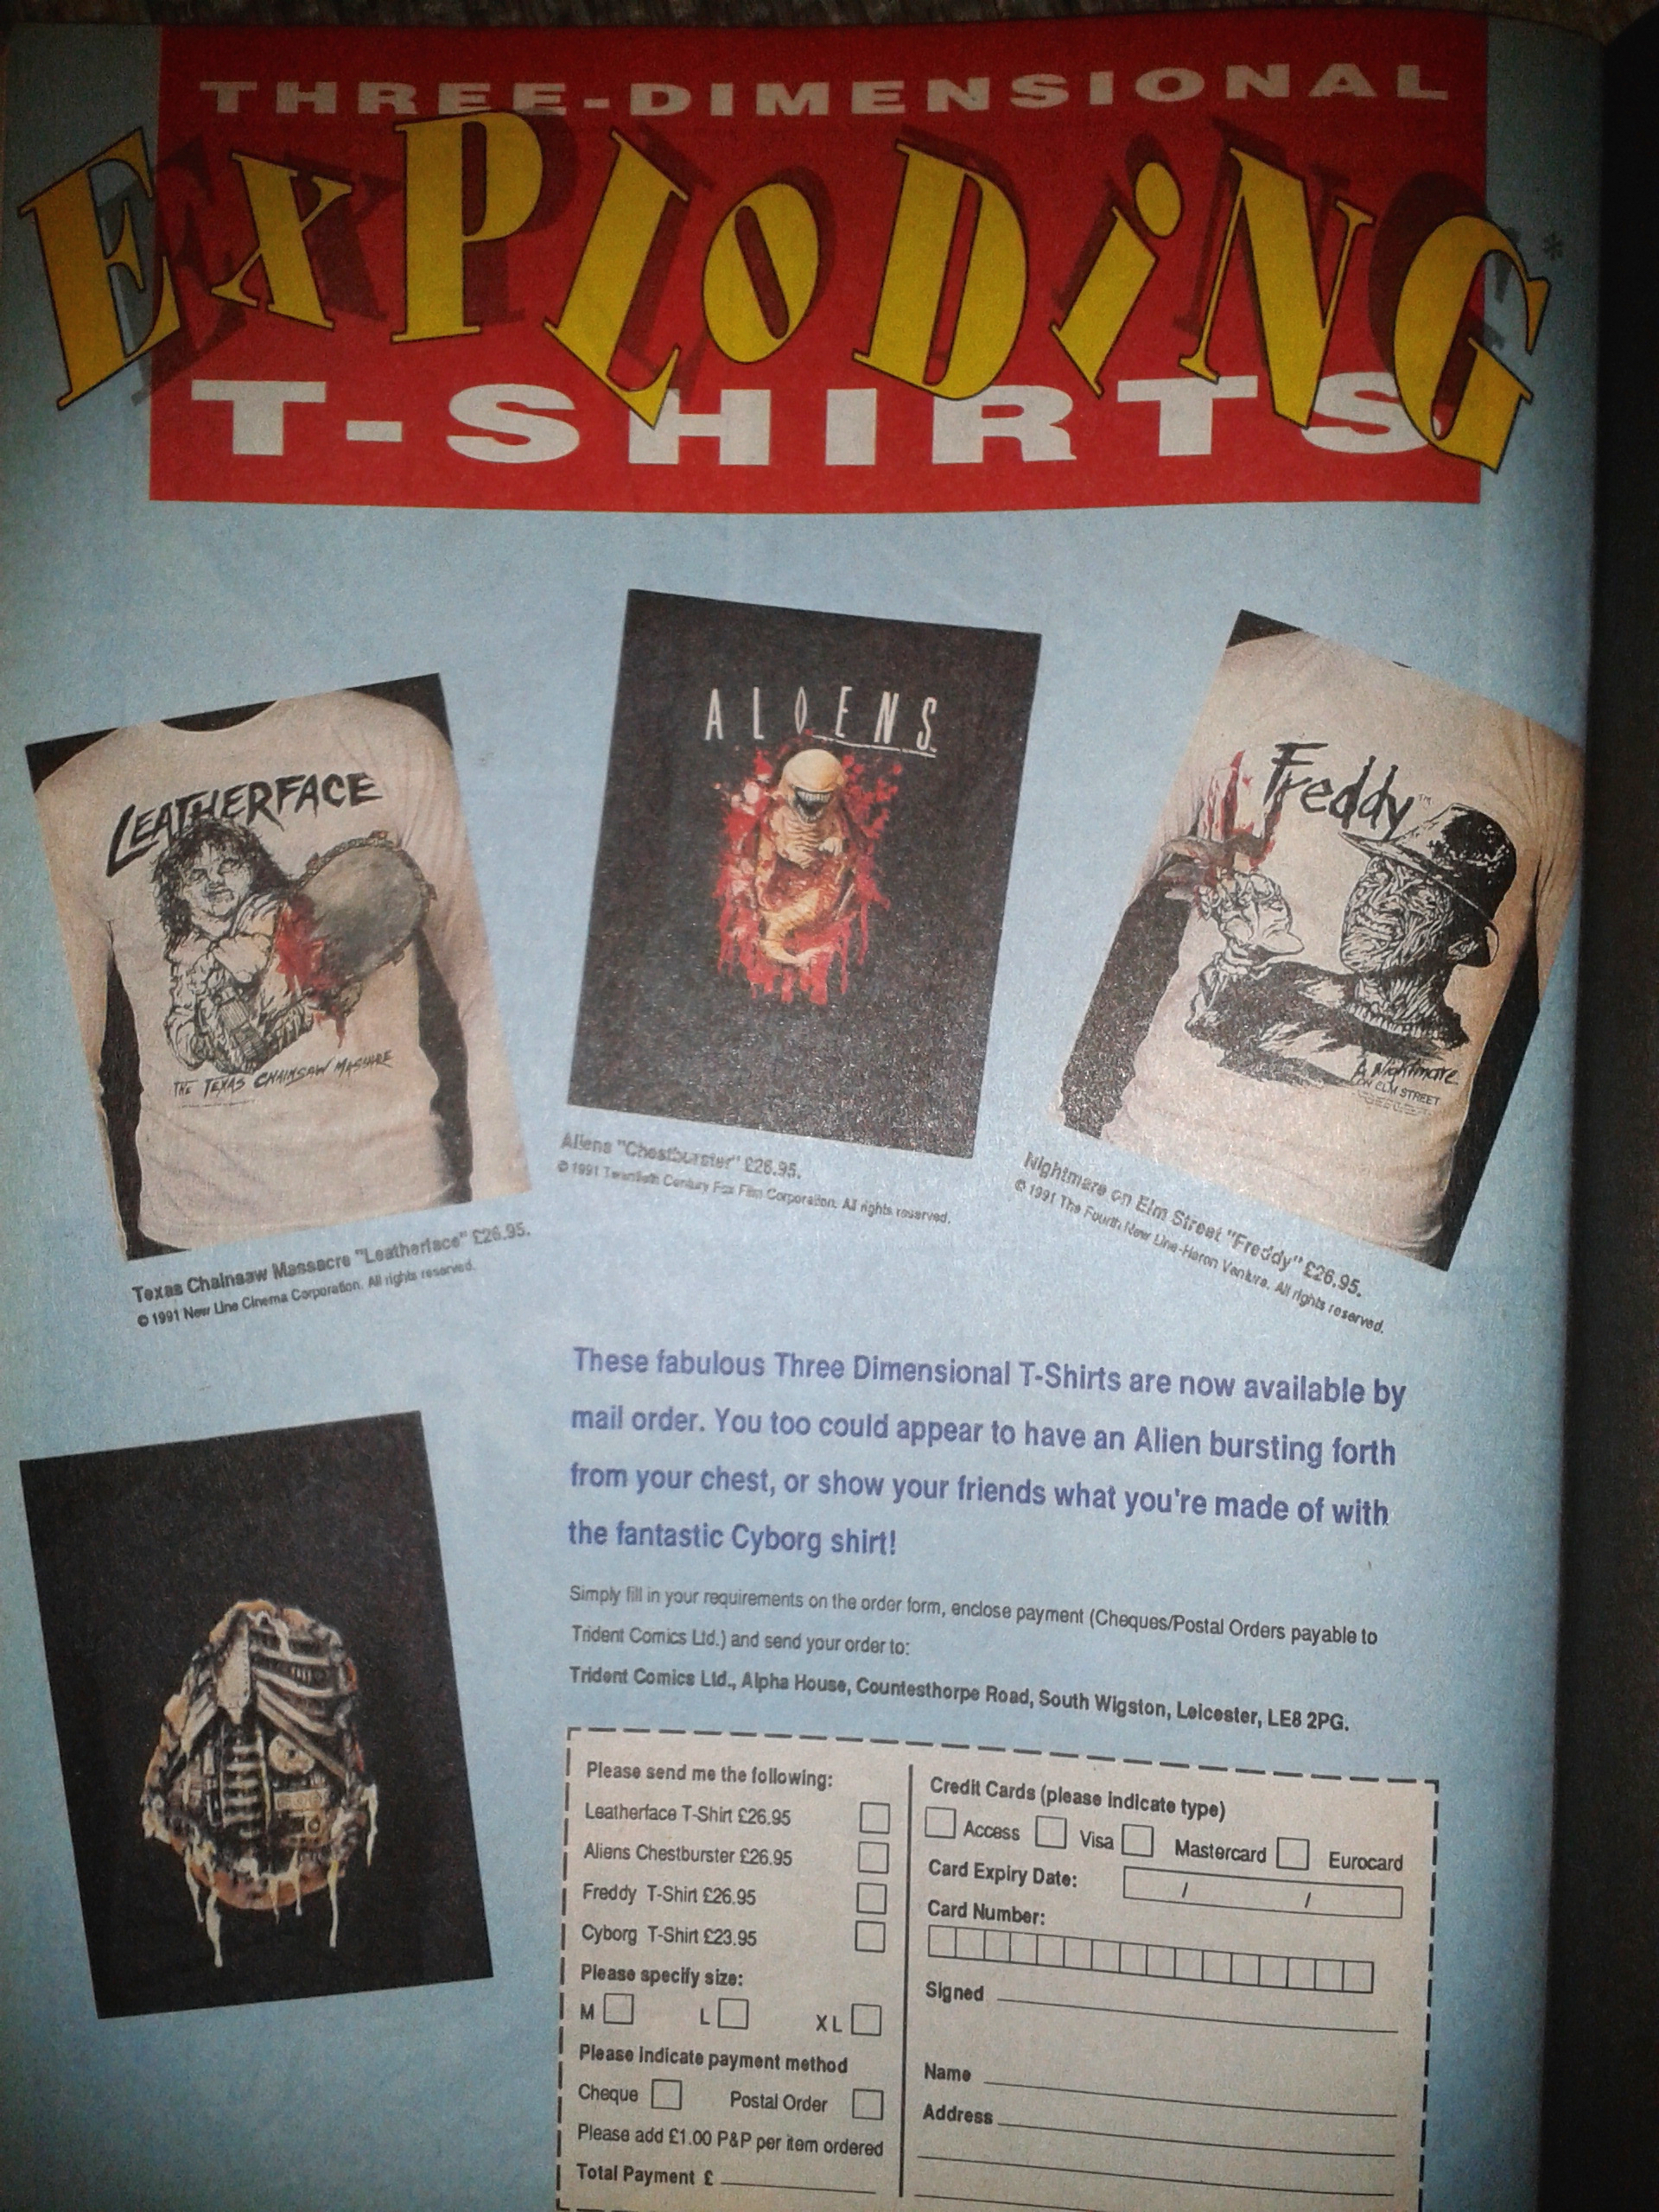 3D Exploding Horror Shirts Advert - 1990s